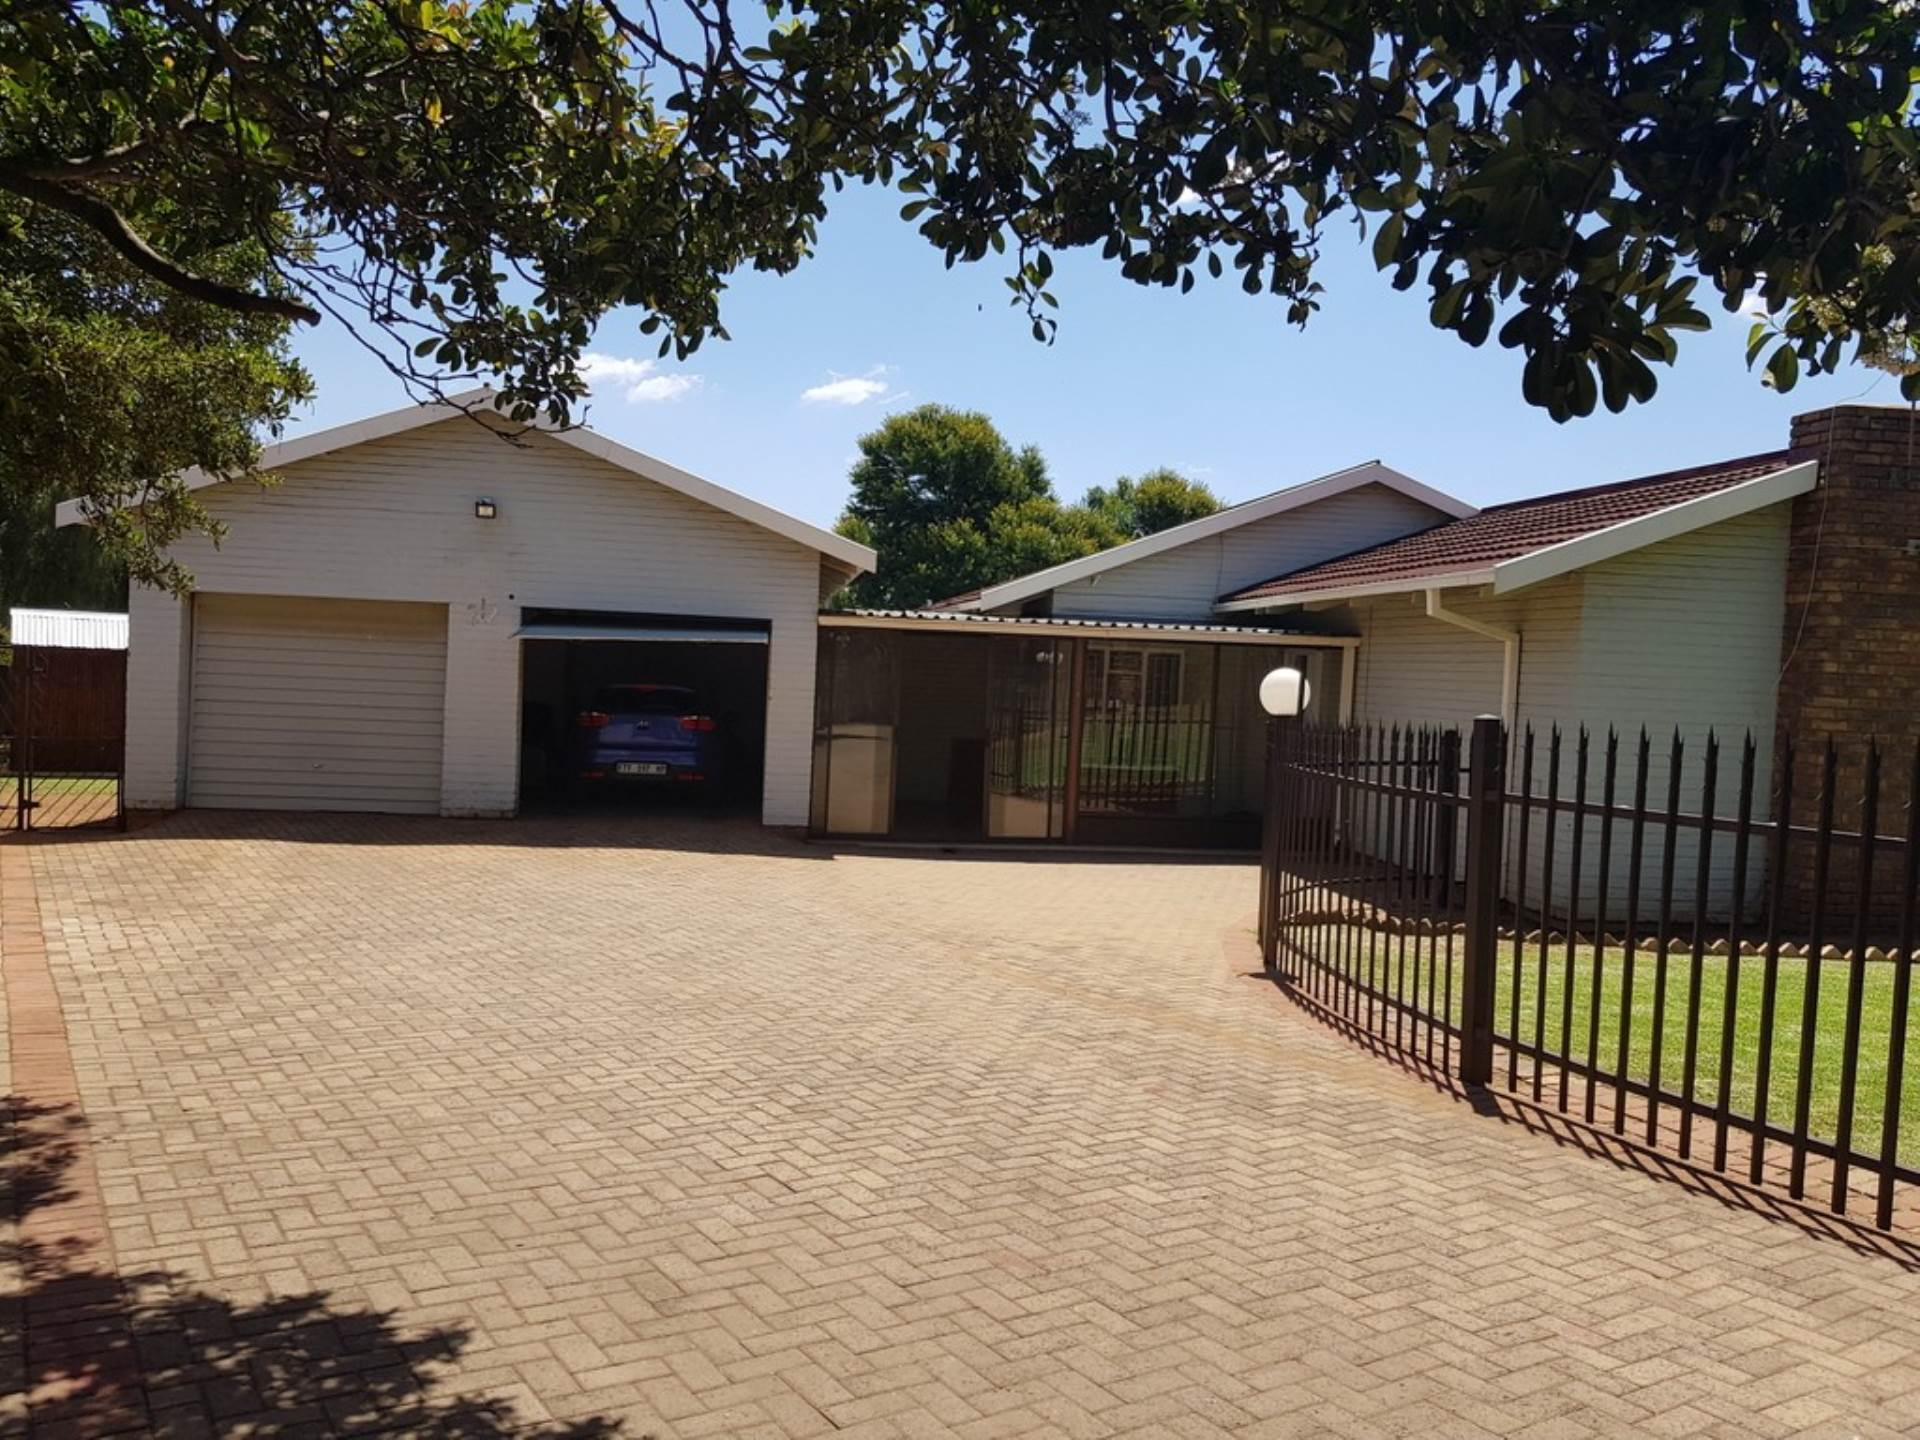 3 BedroomHouse For Sale In Kanonkop